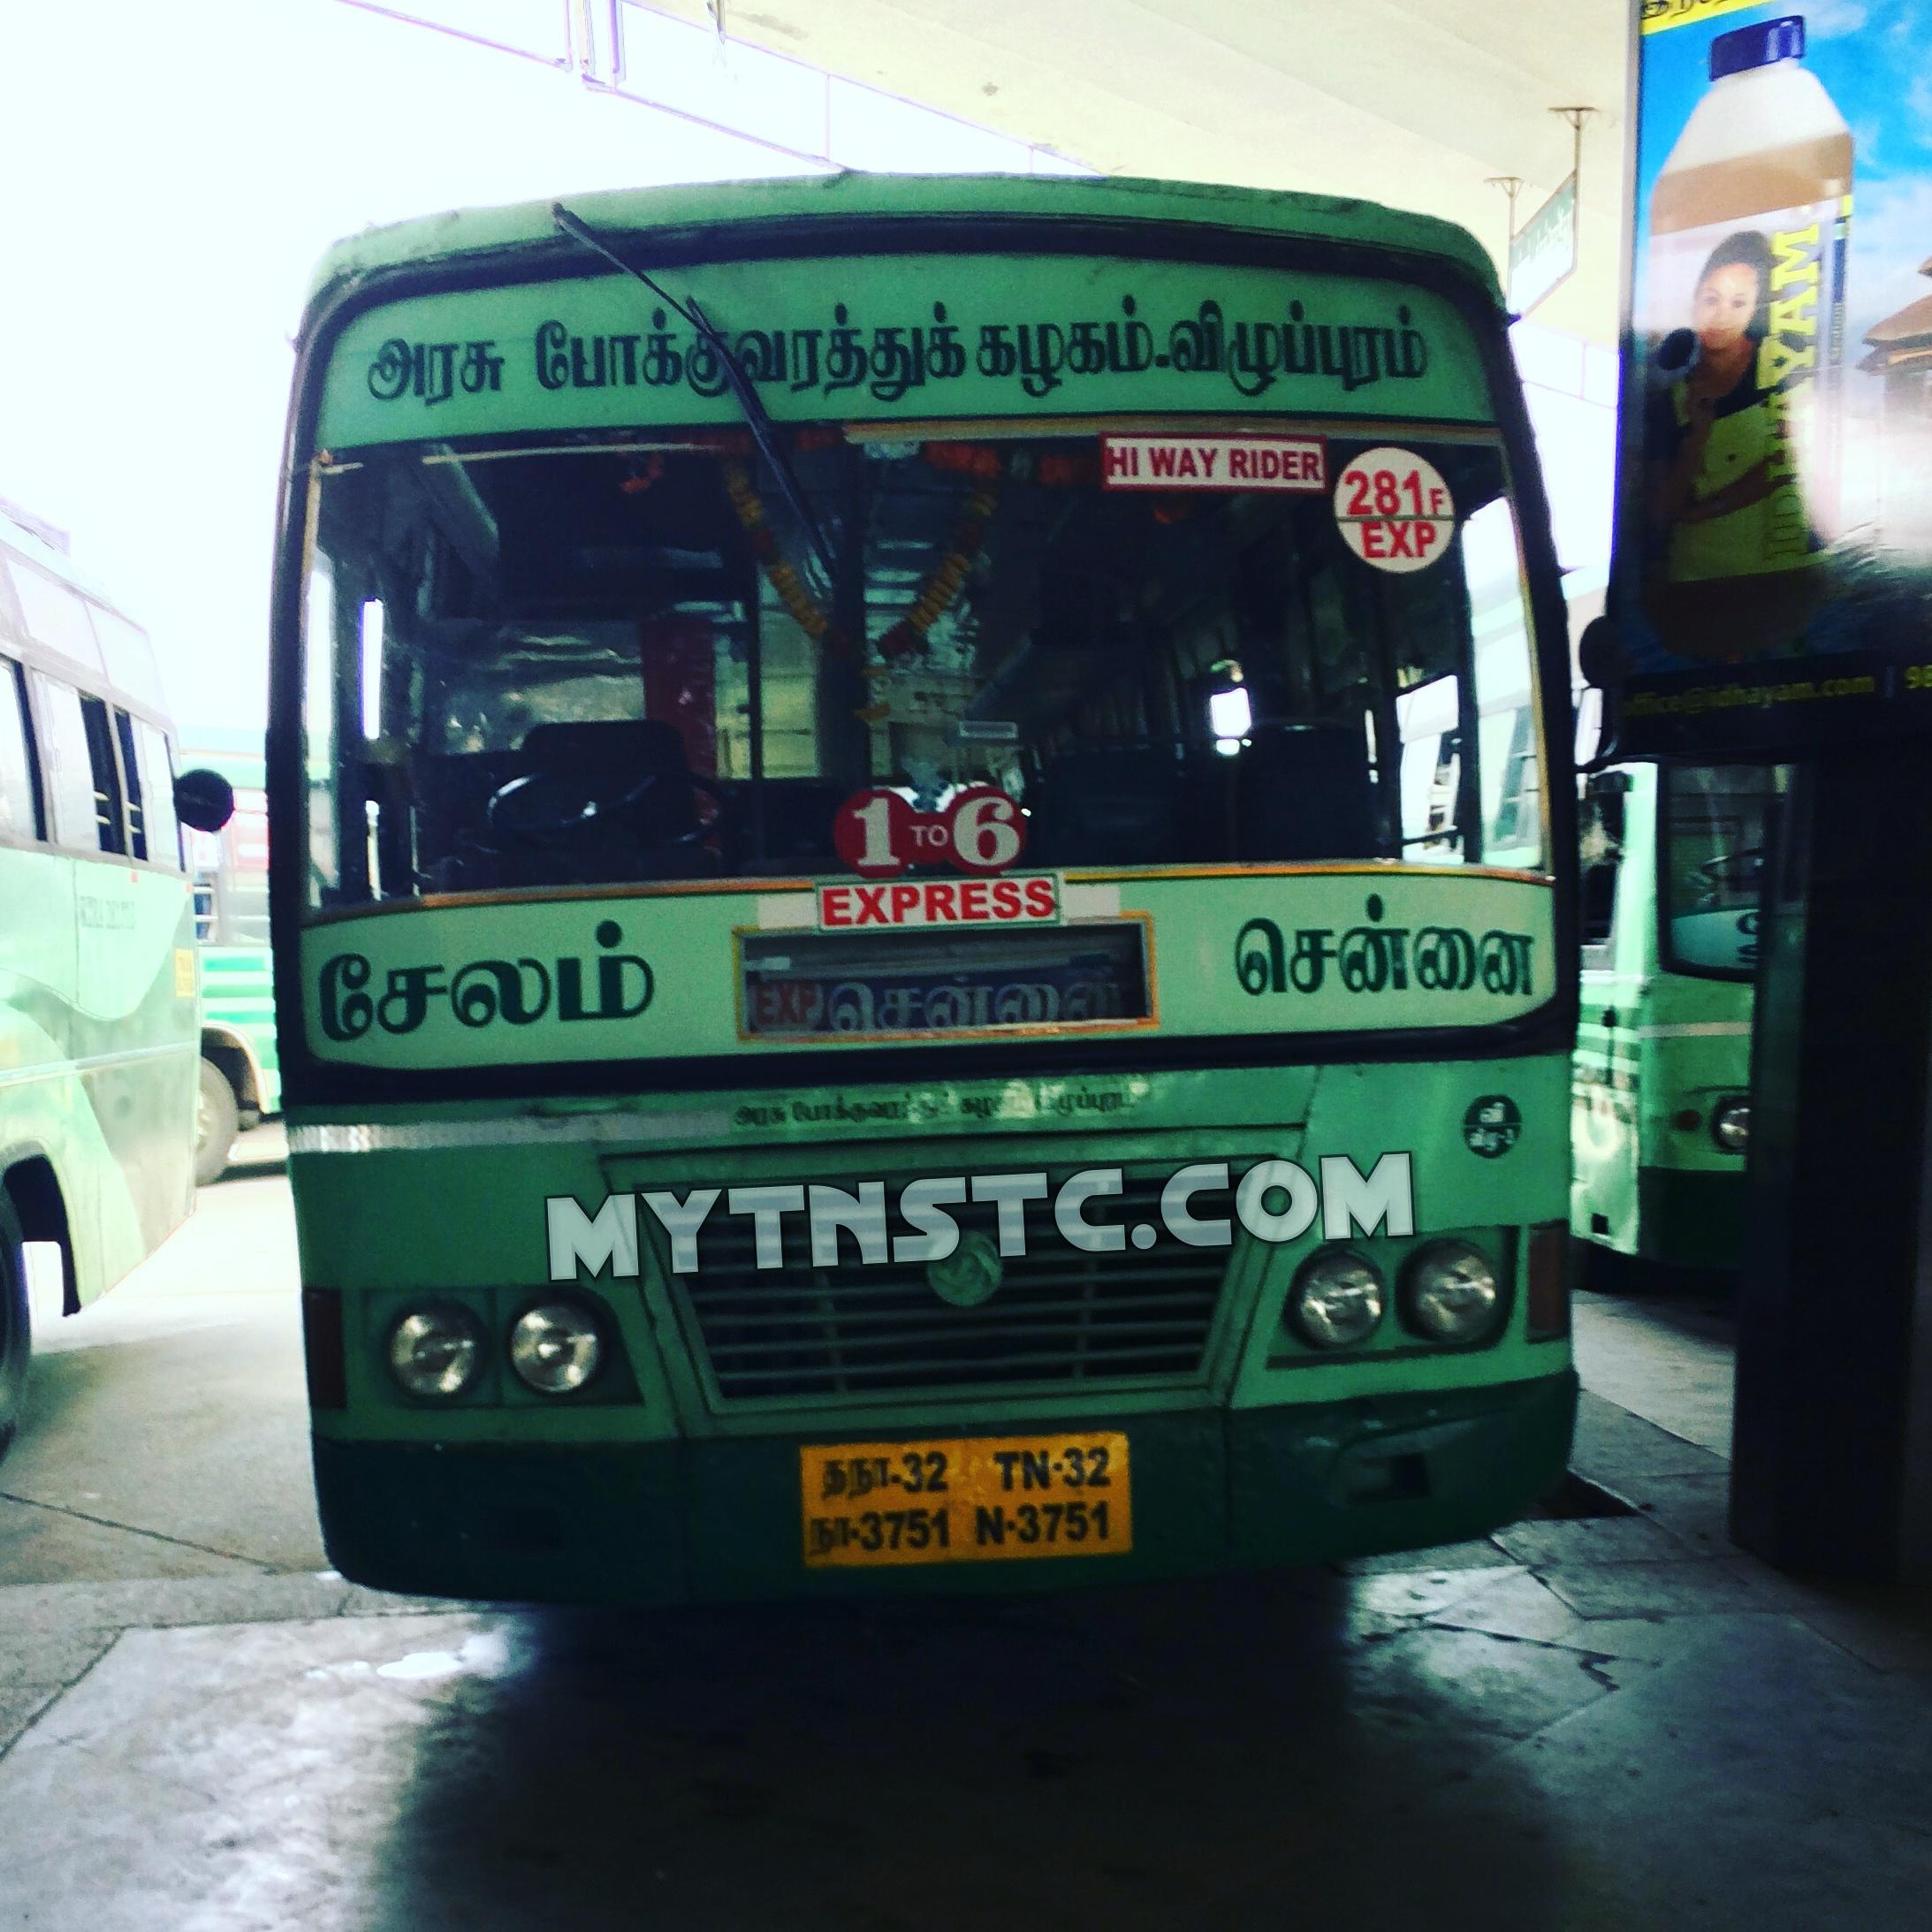 TNSTC Chennai to Salem TN 32 N 3751